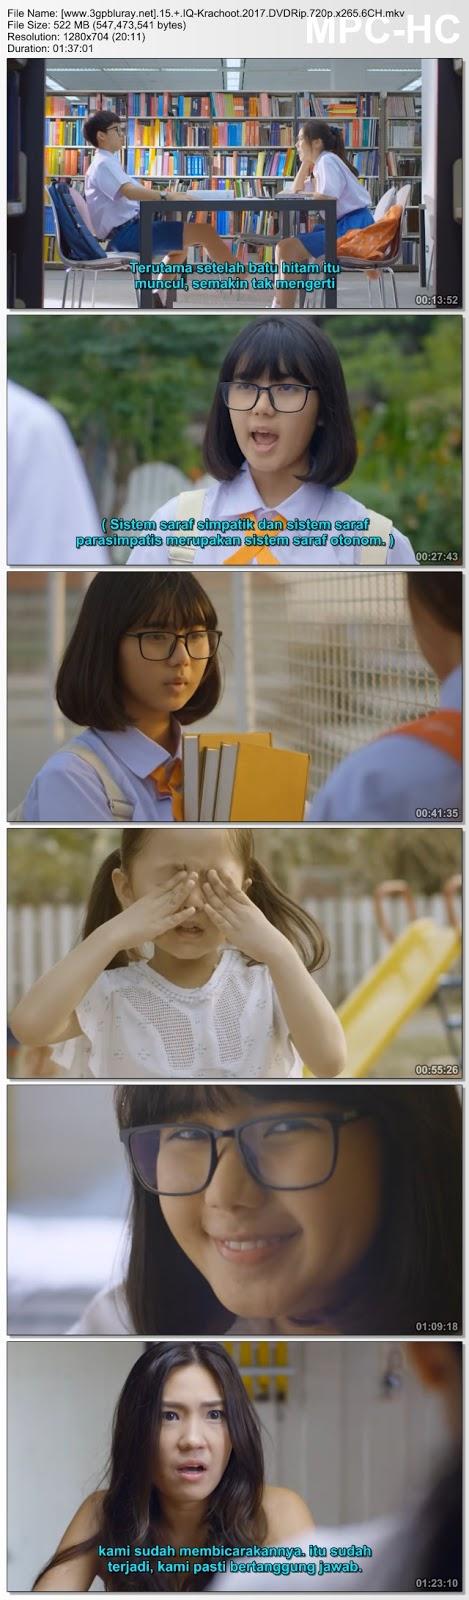 Screenshots Download Film Gratis Hardsub Indo 15+ IQ Krachoot (2017) DVDRip 480p MP4 Subtitle Bahasa Indonesia 3GP